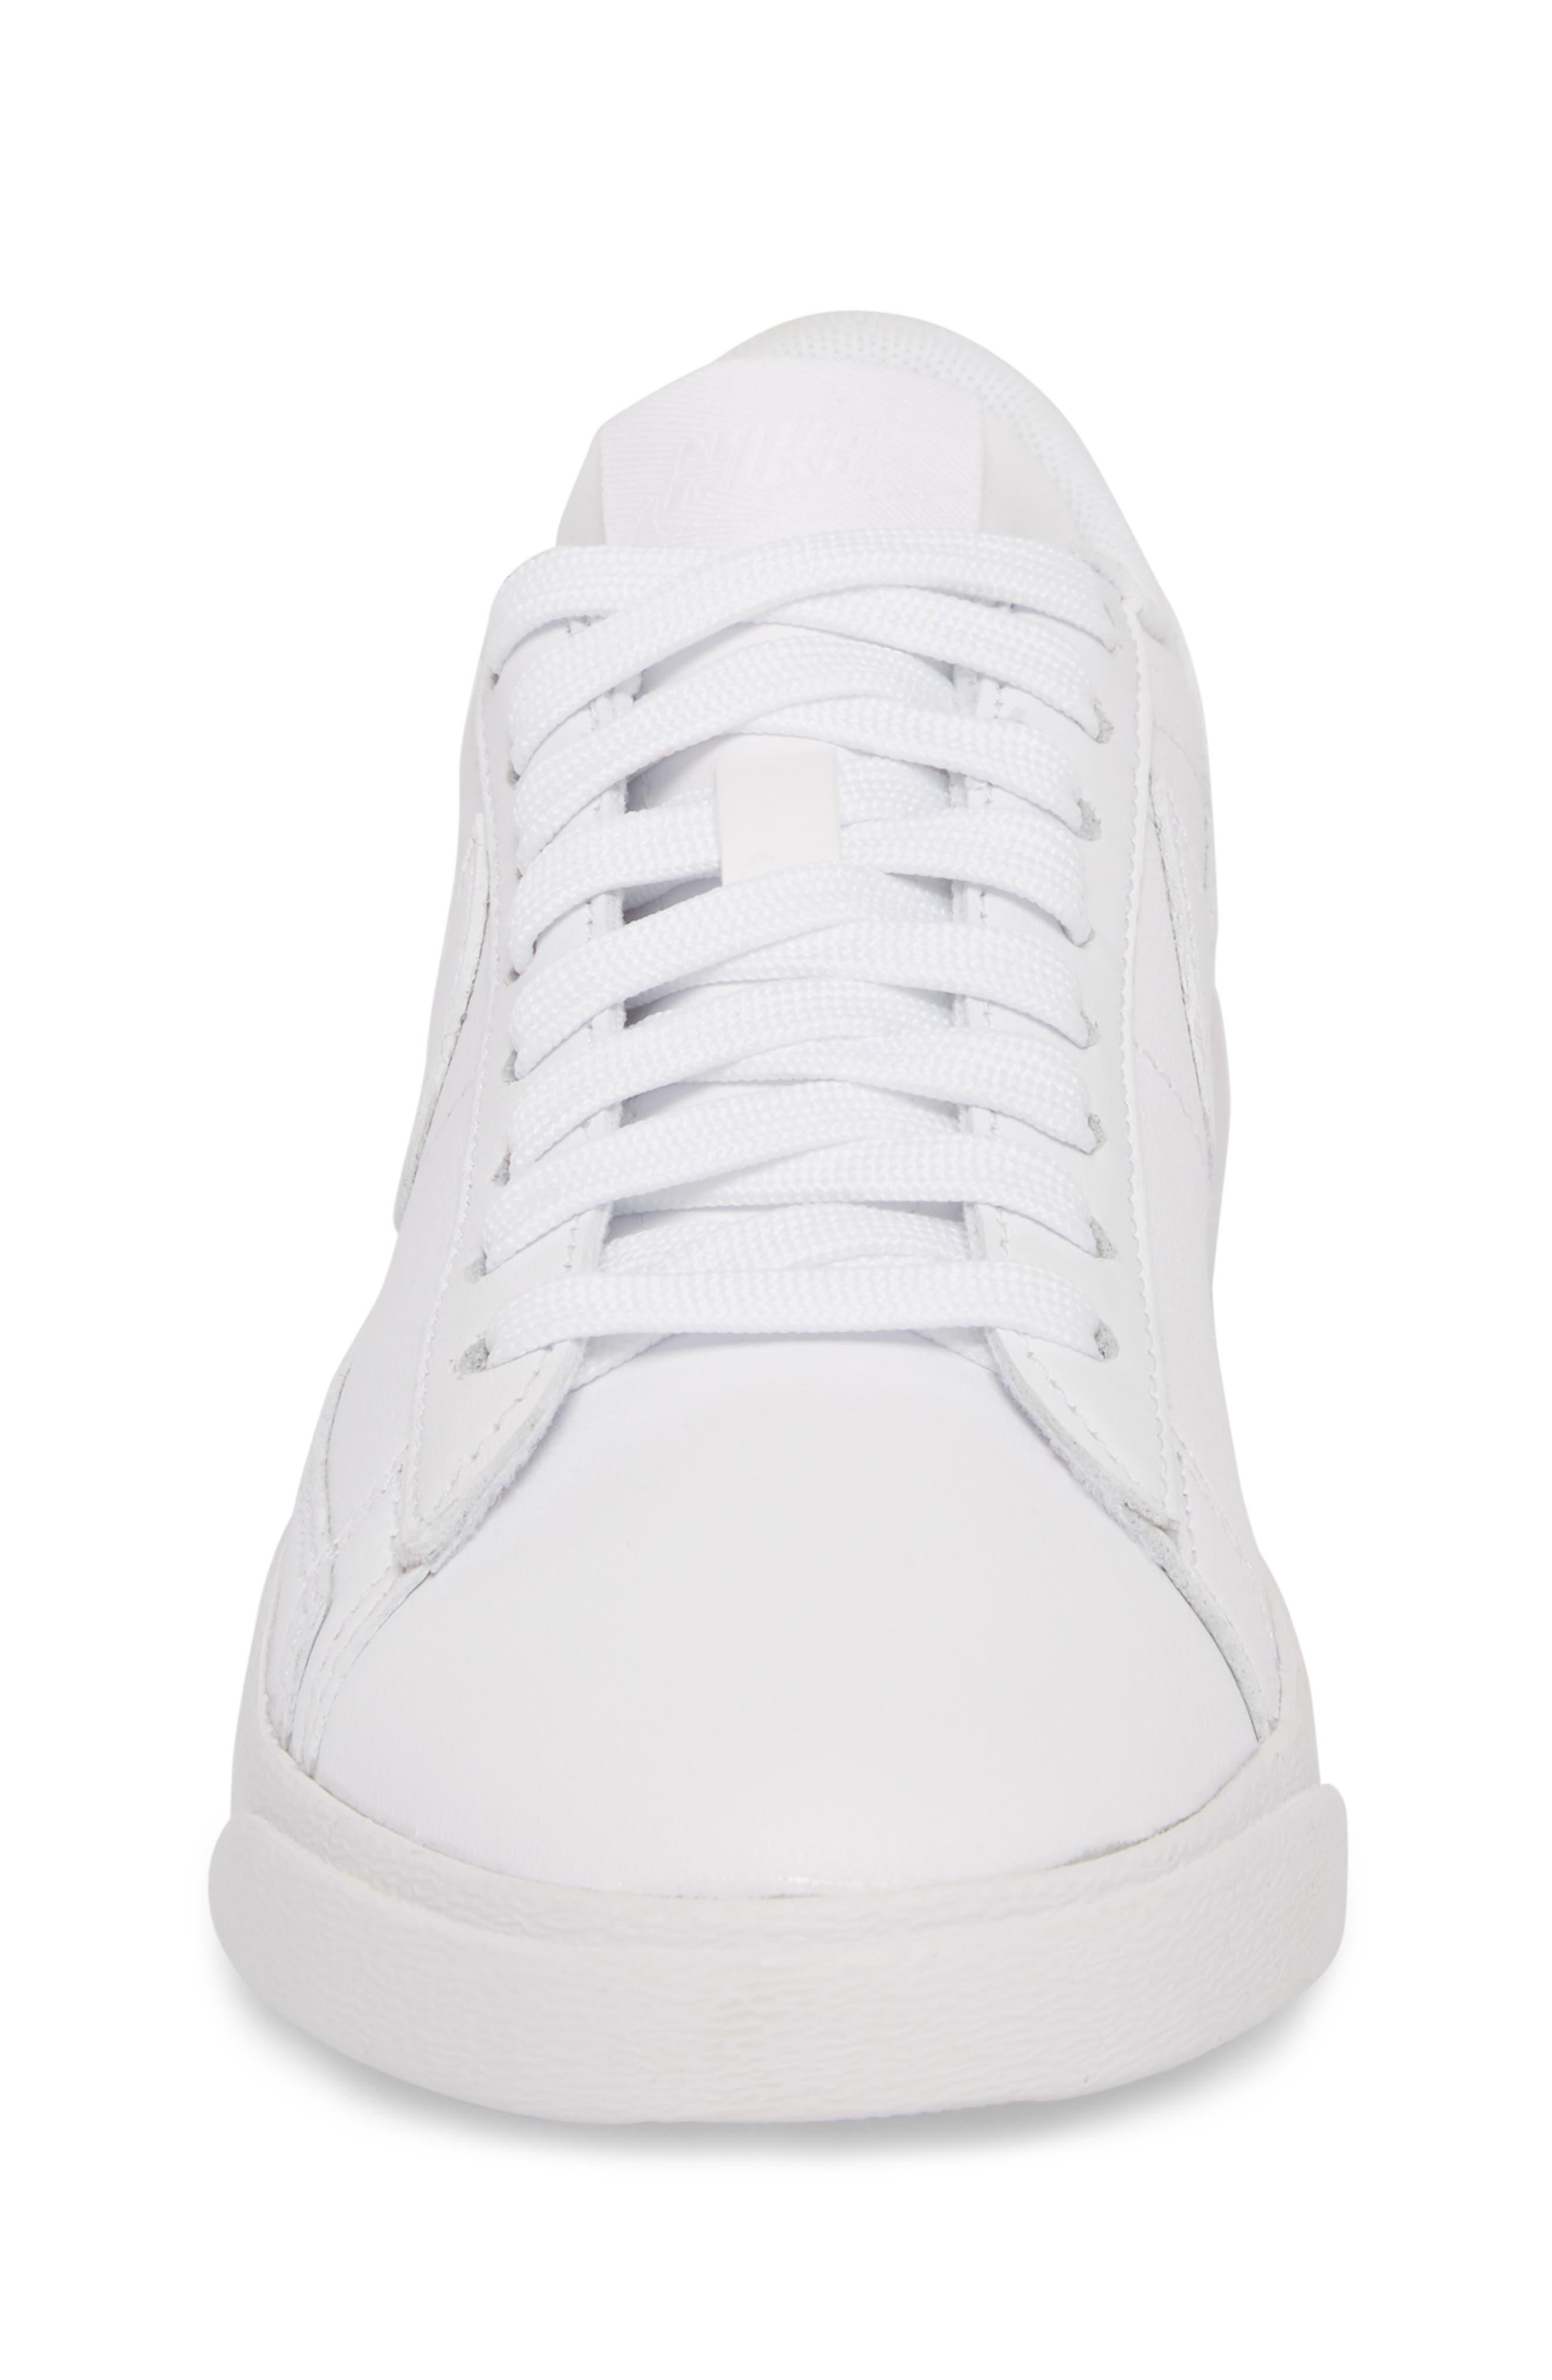 Blazer Low LE Sneaker,                             Alternate thumbnail 4, color,                             104